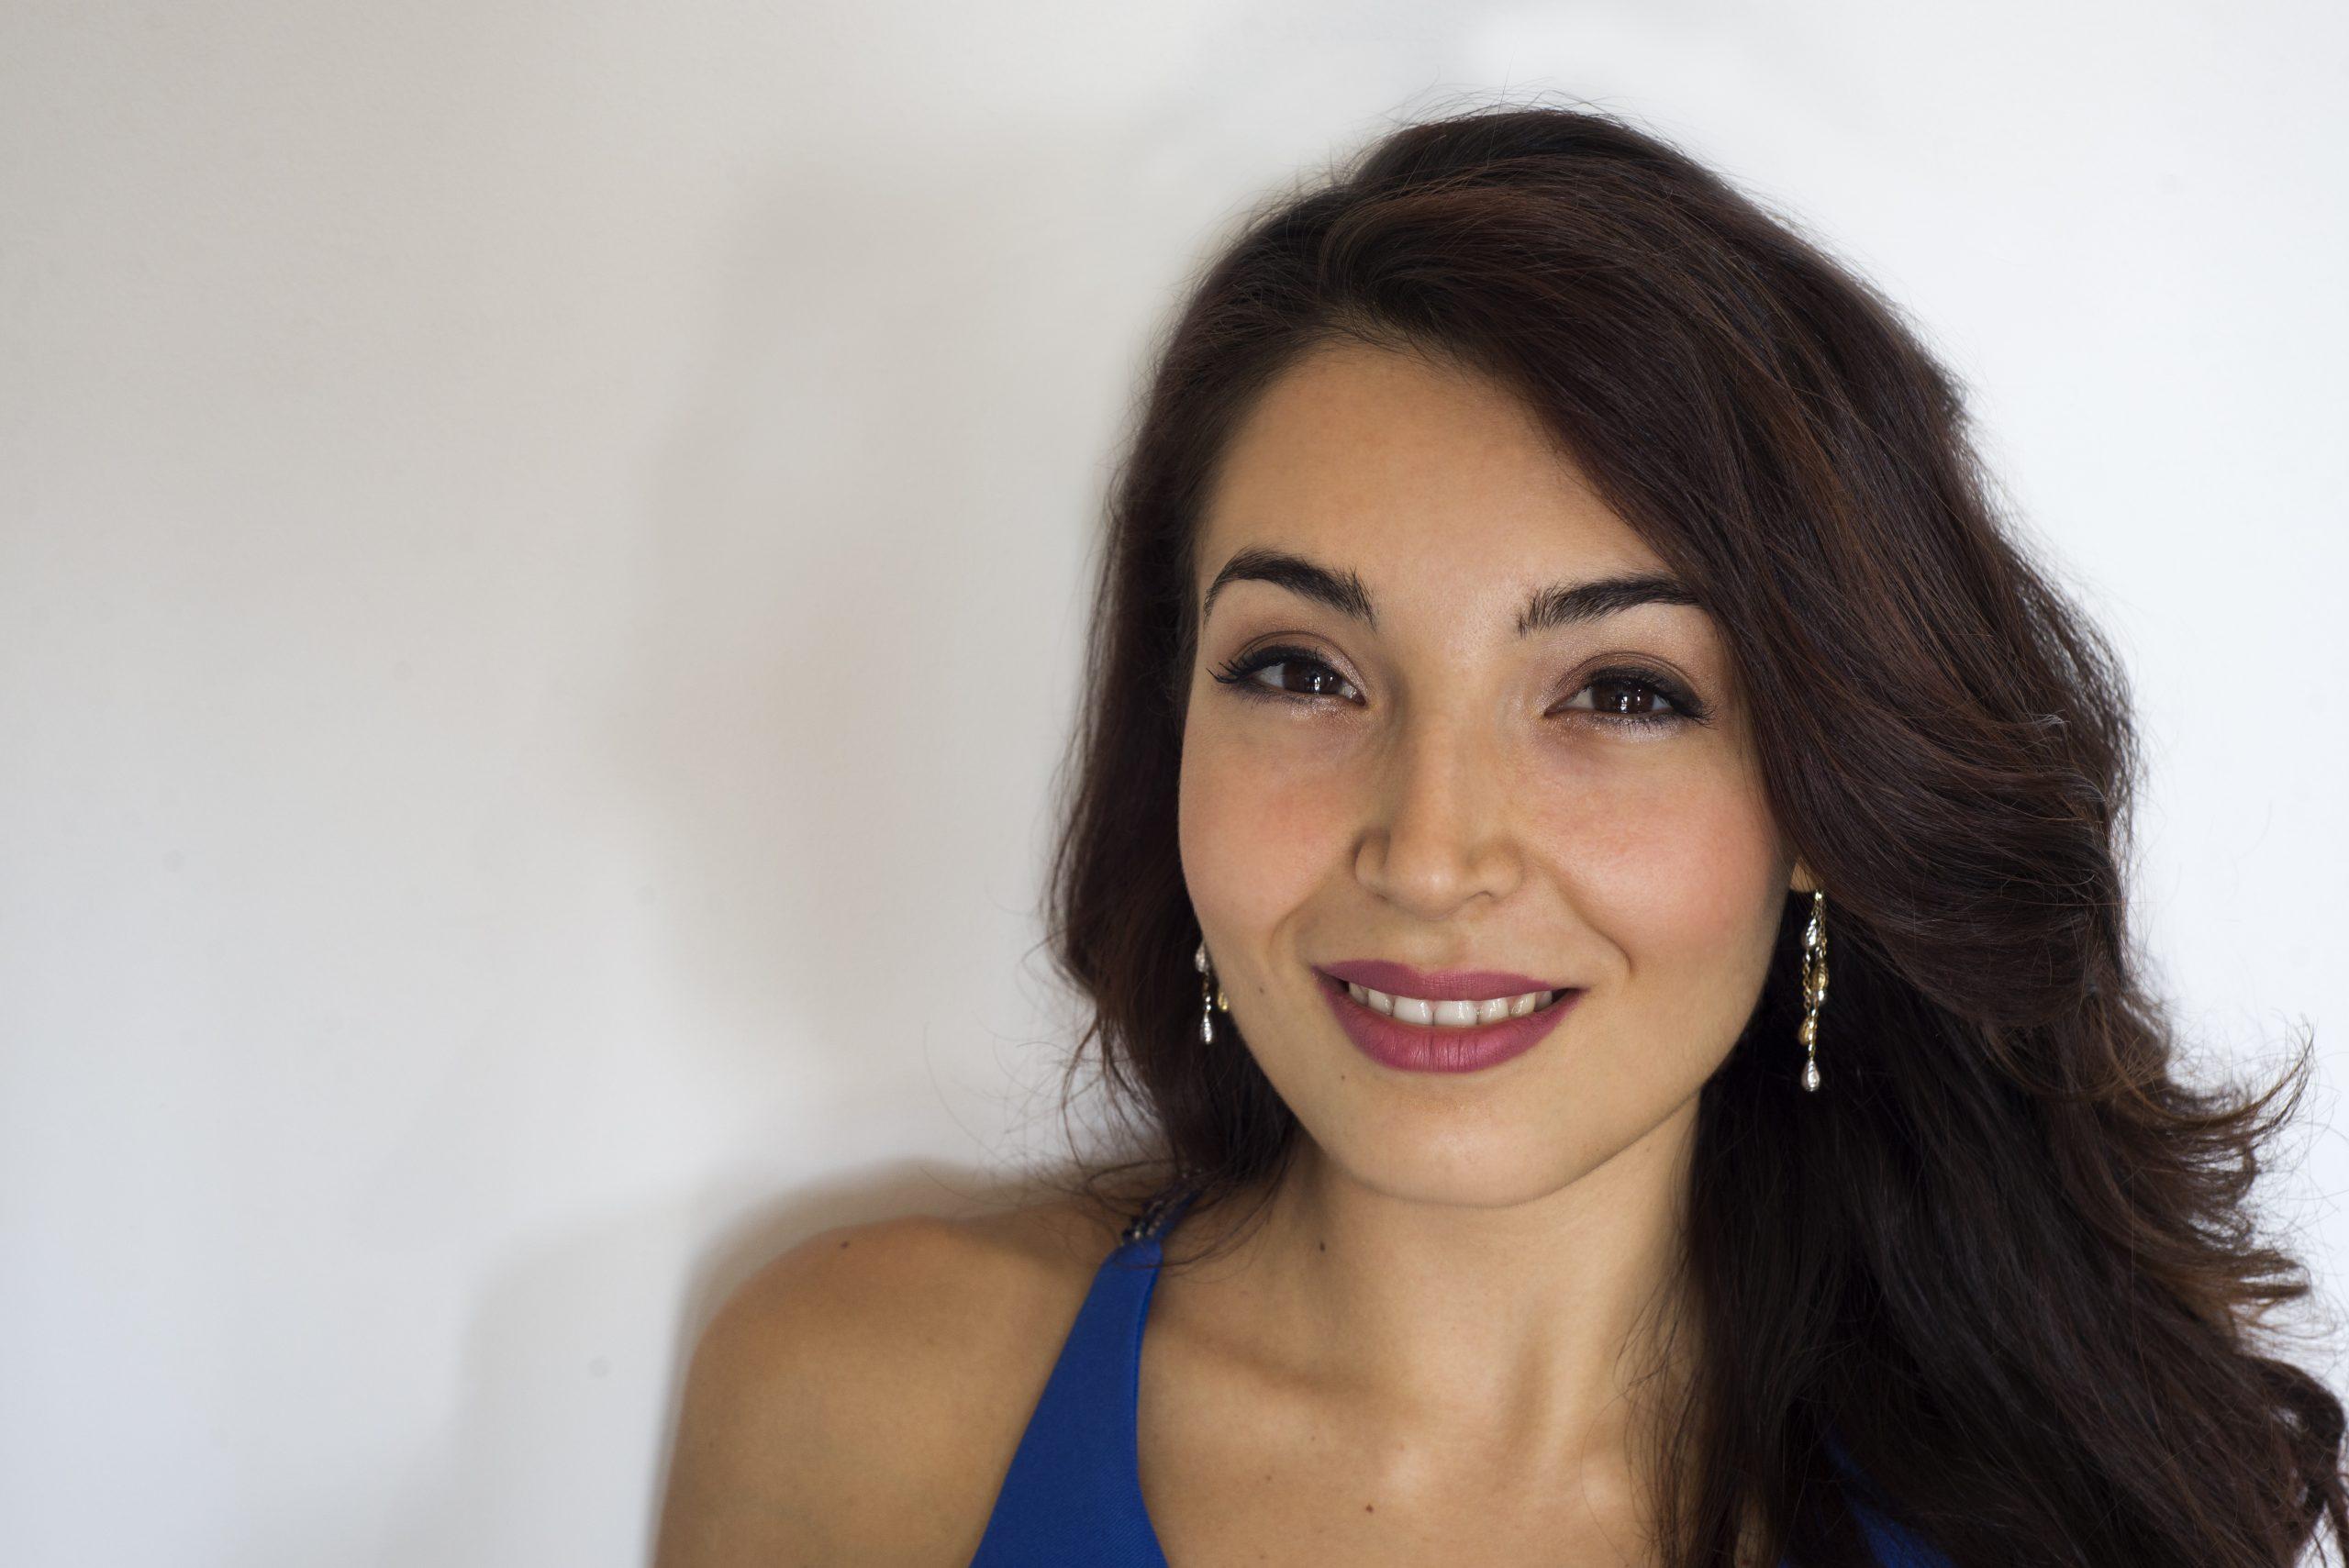 Chiara D'Acunto